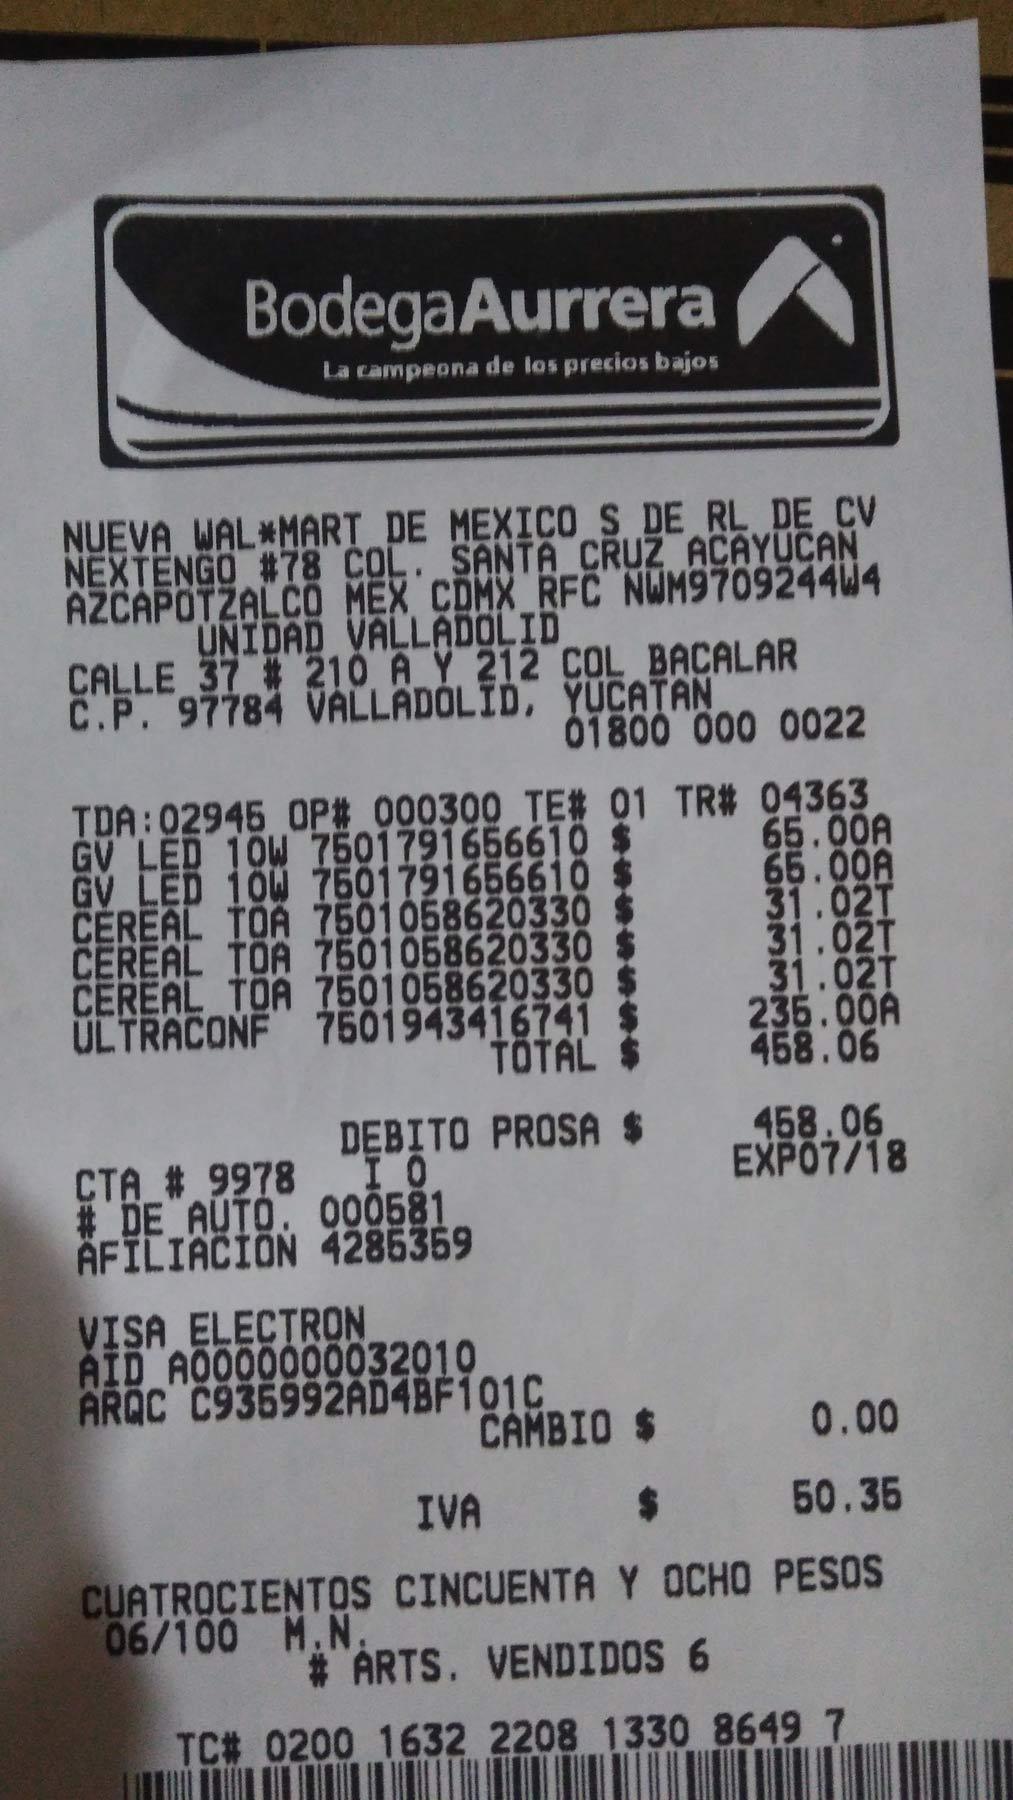 Bodega Aurrerá Valladolid: Kit cereal + toallitas